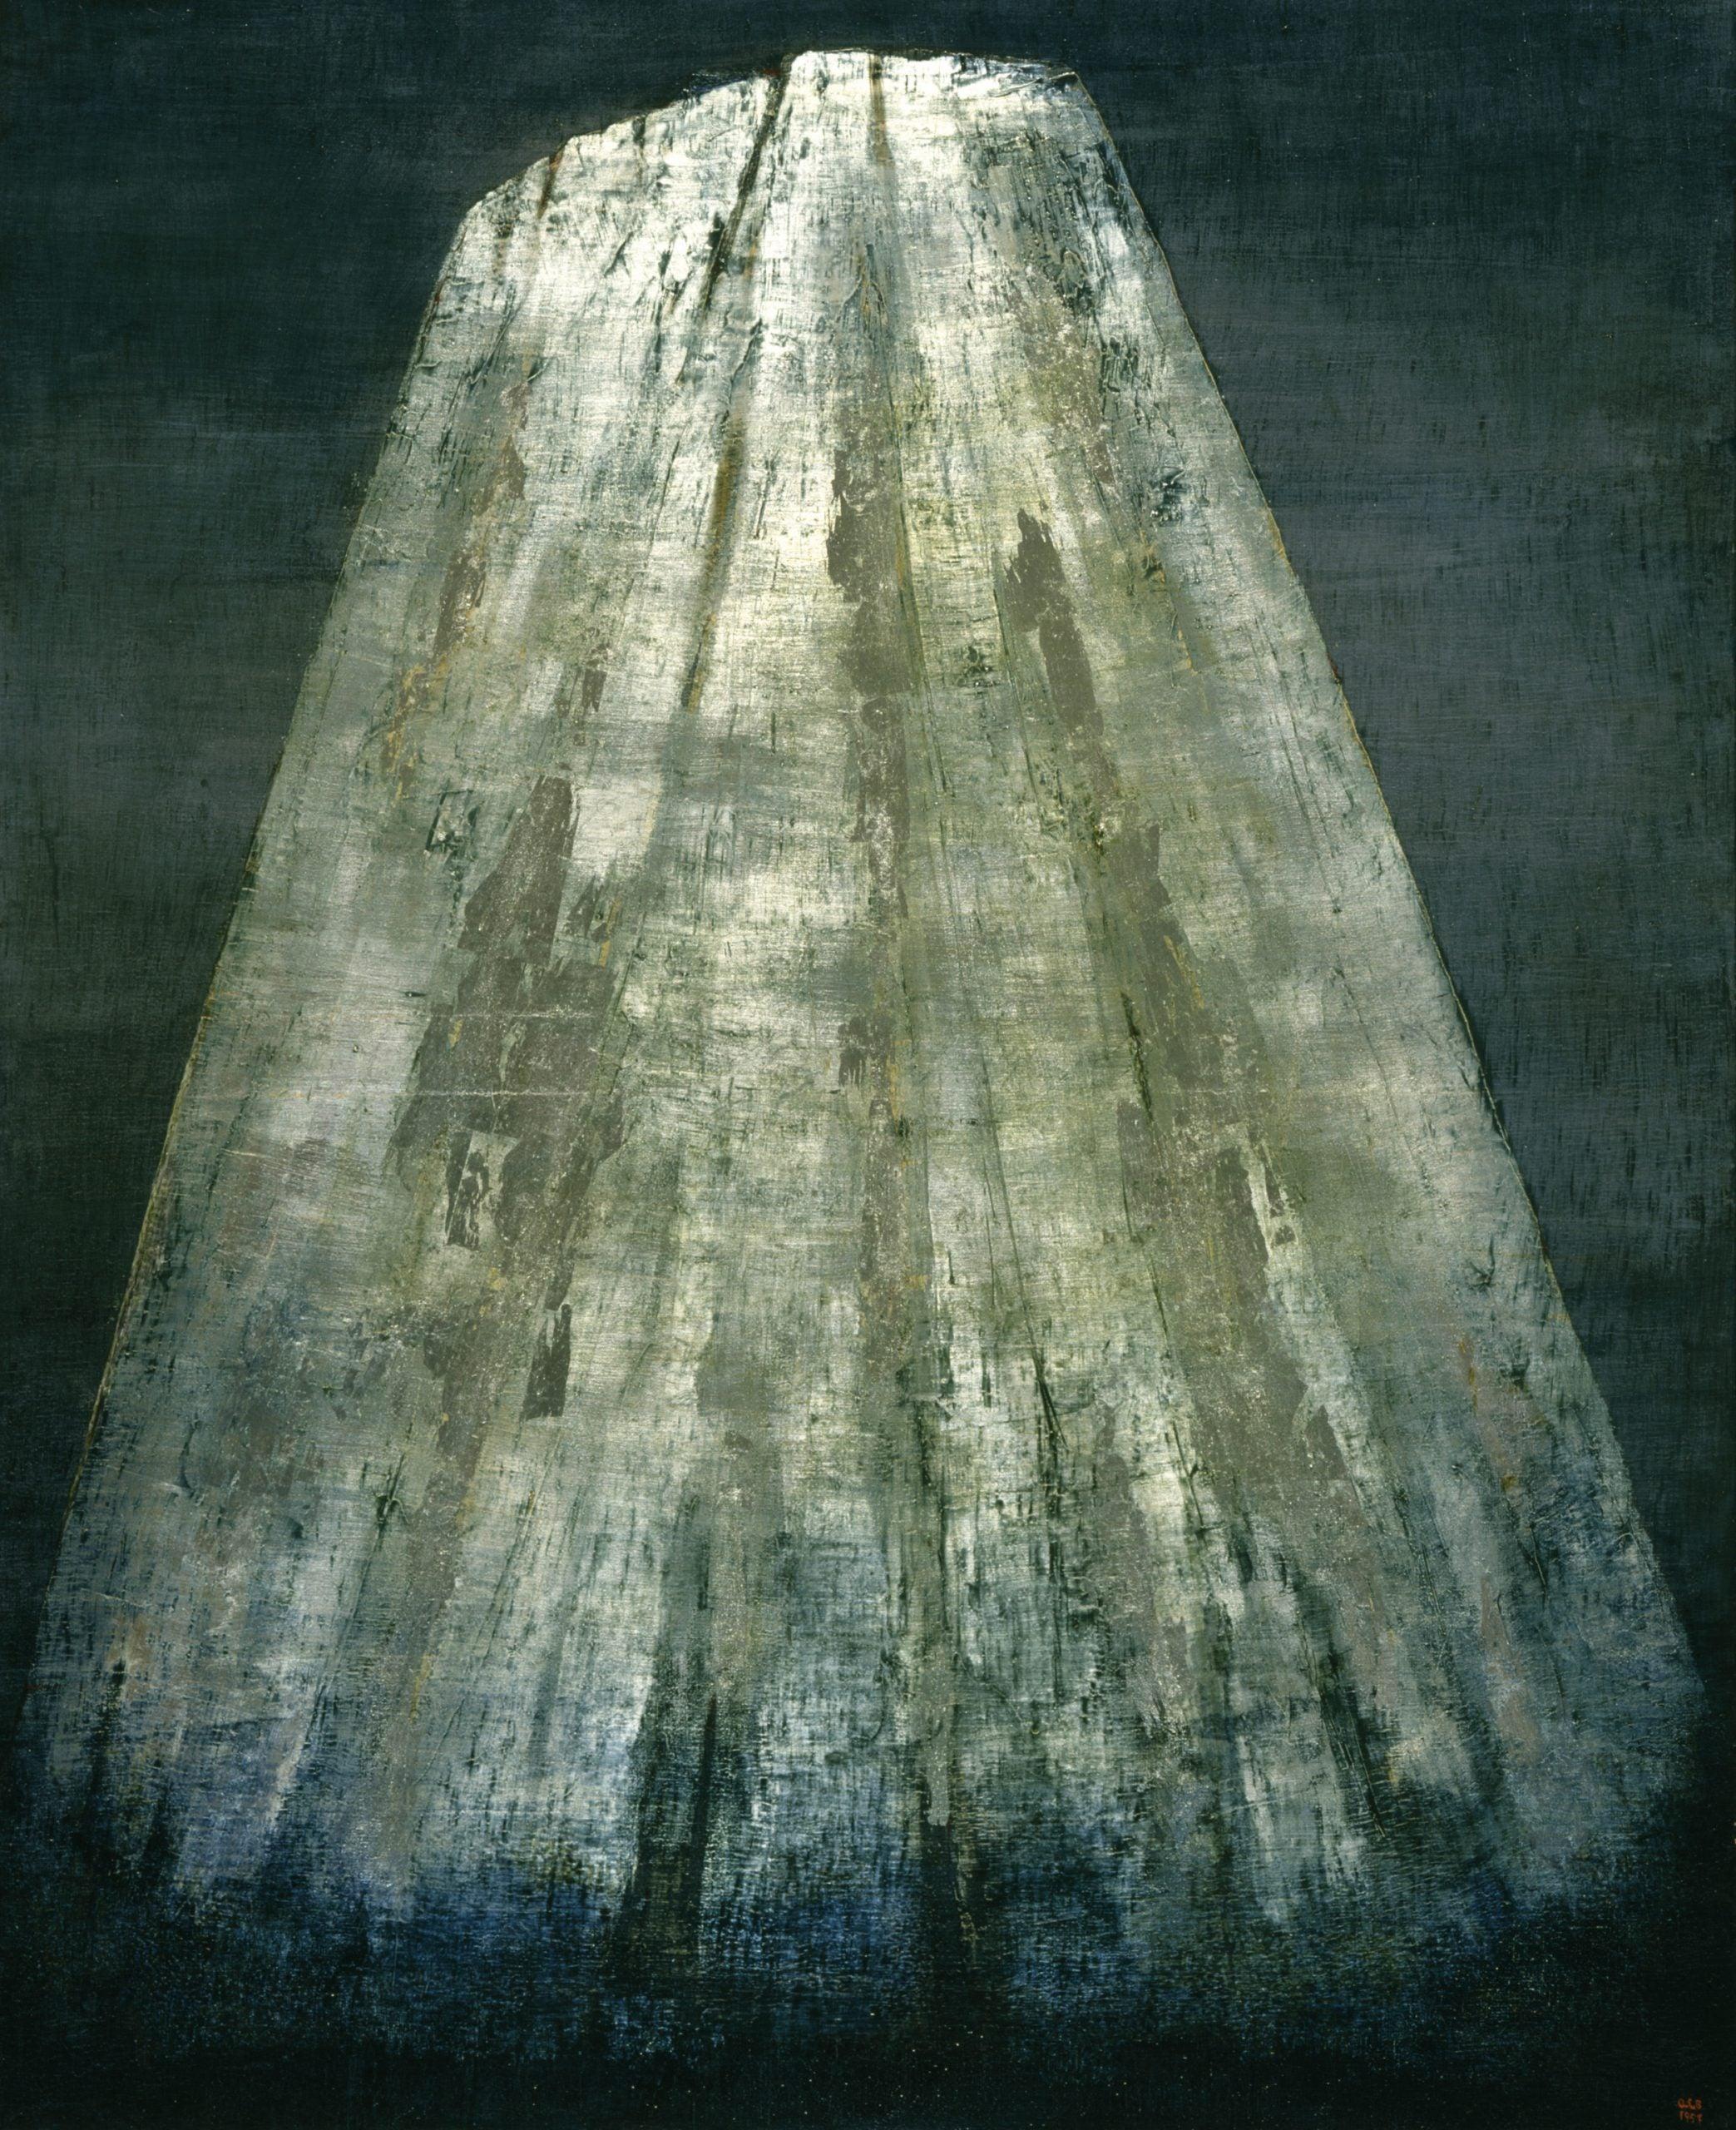 The pared-back landscapes of Anna-Eva Bergman